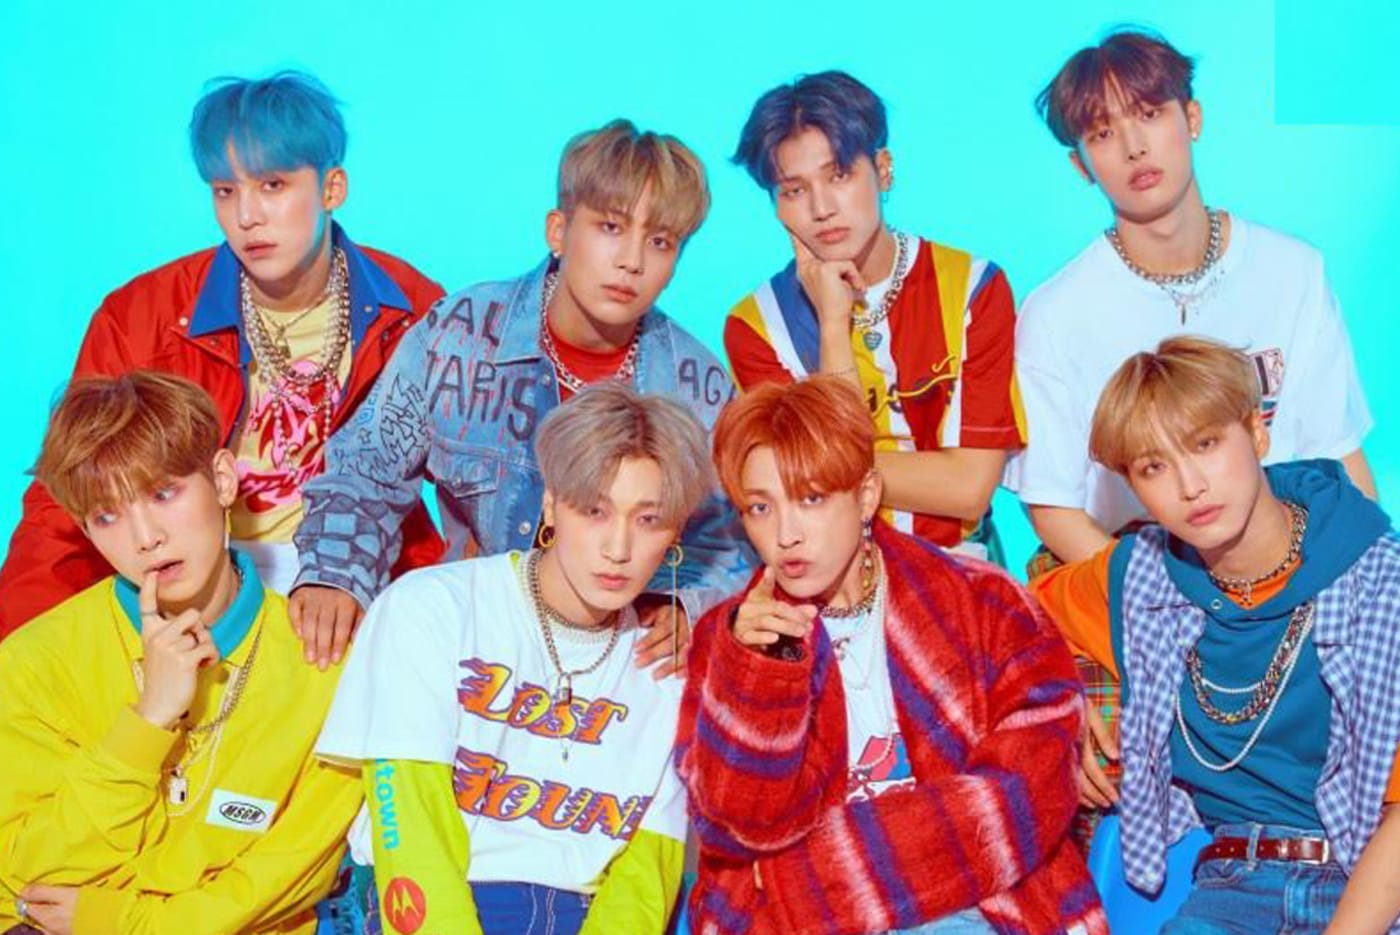 Korean Pop group ATEEZ